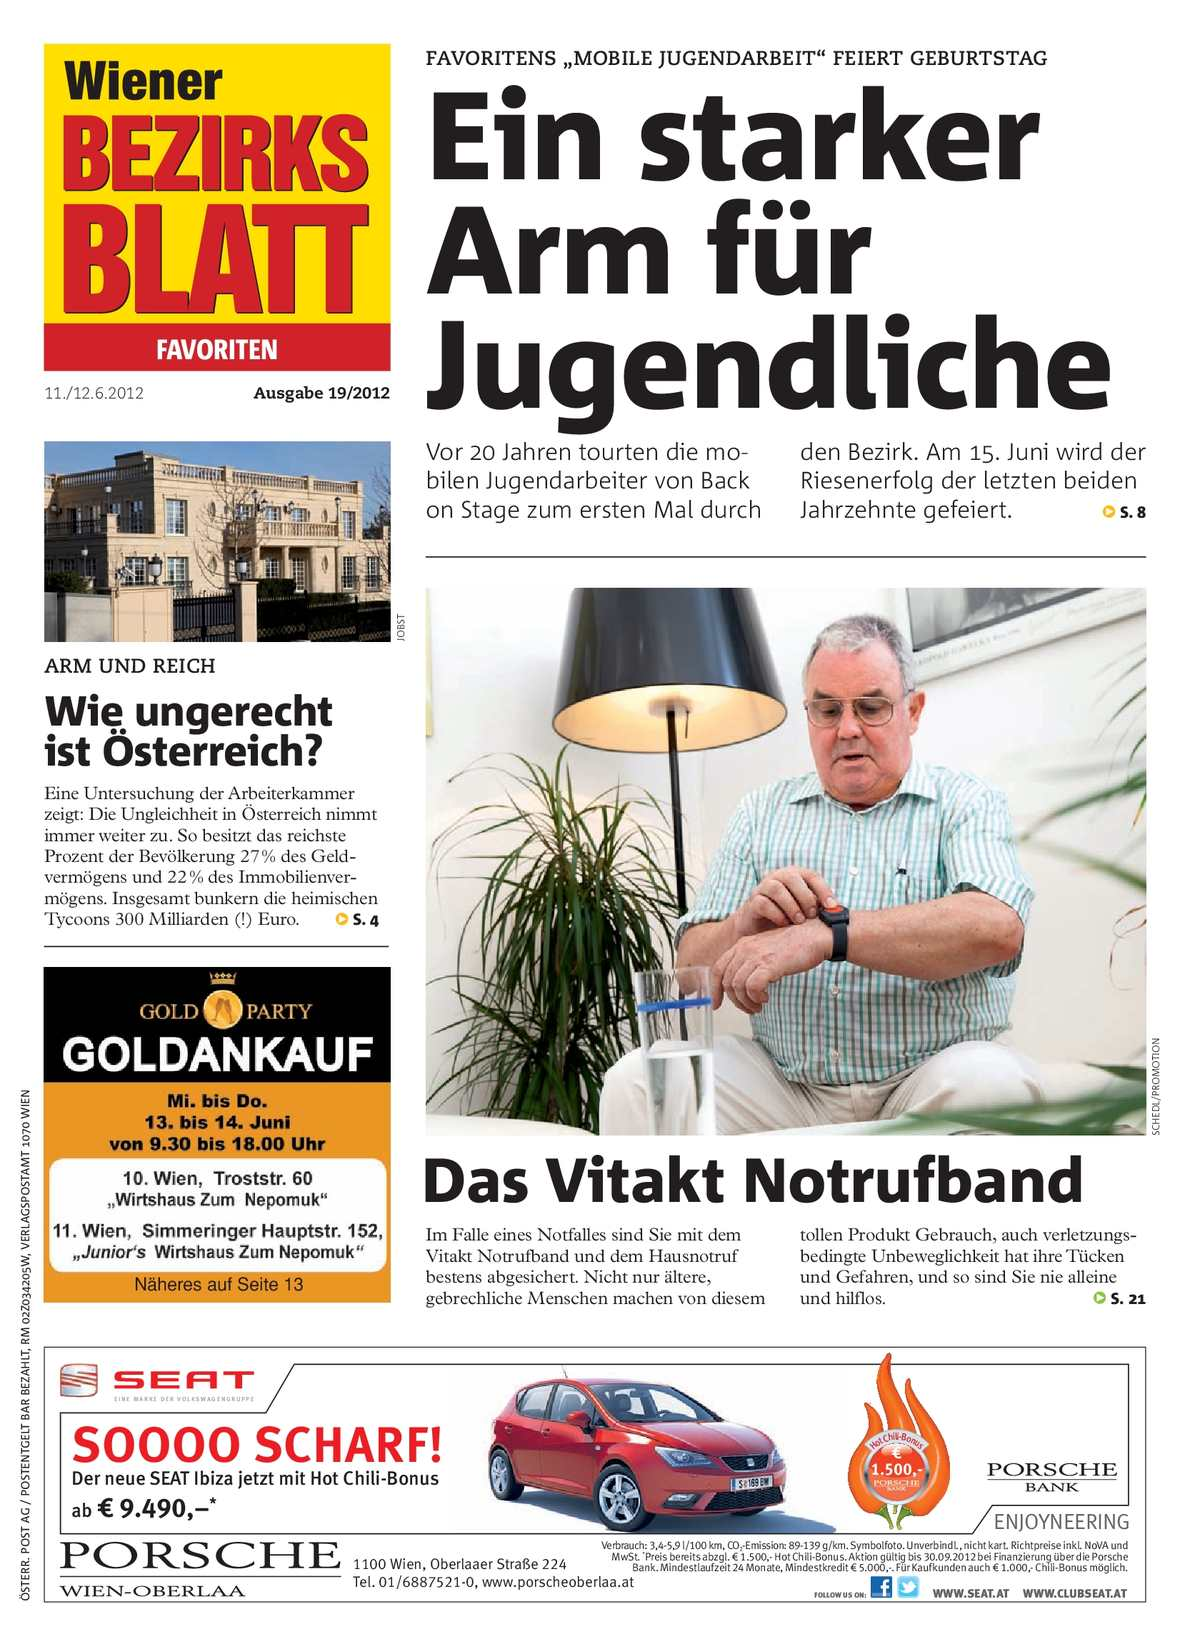 Loosdorf kontakt partnervermittlung, Singlebrsen in grohflein